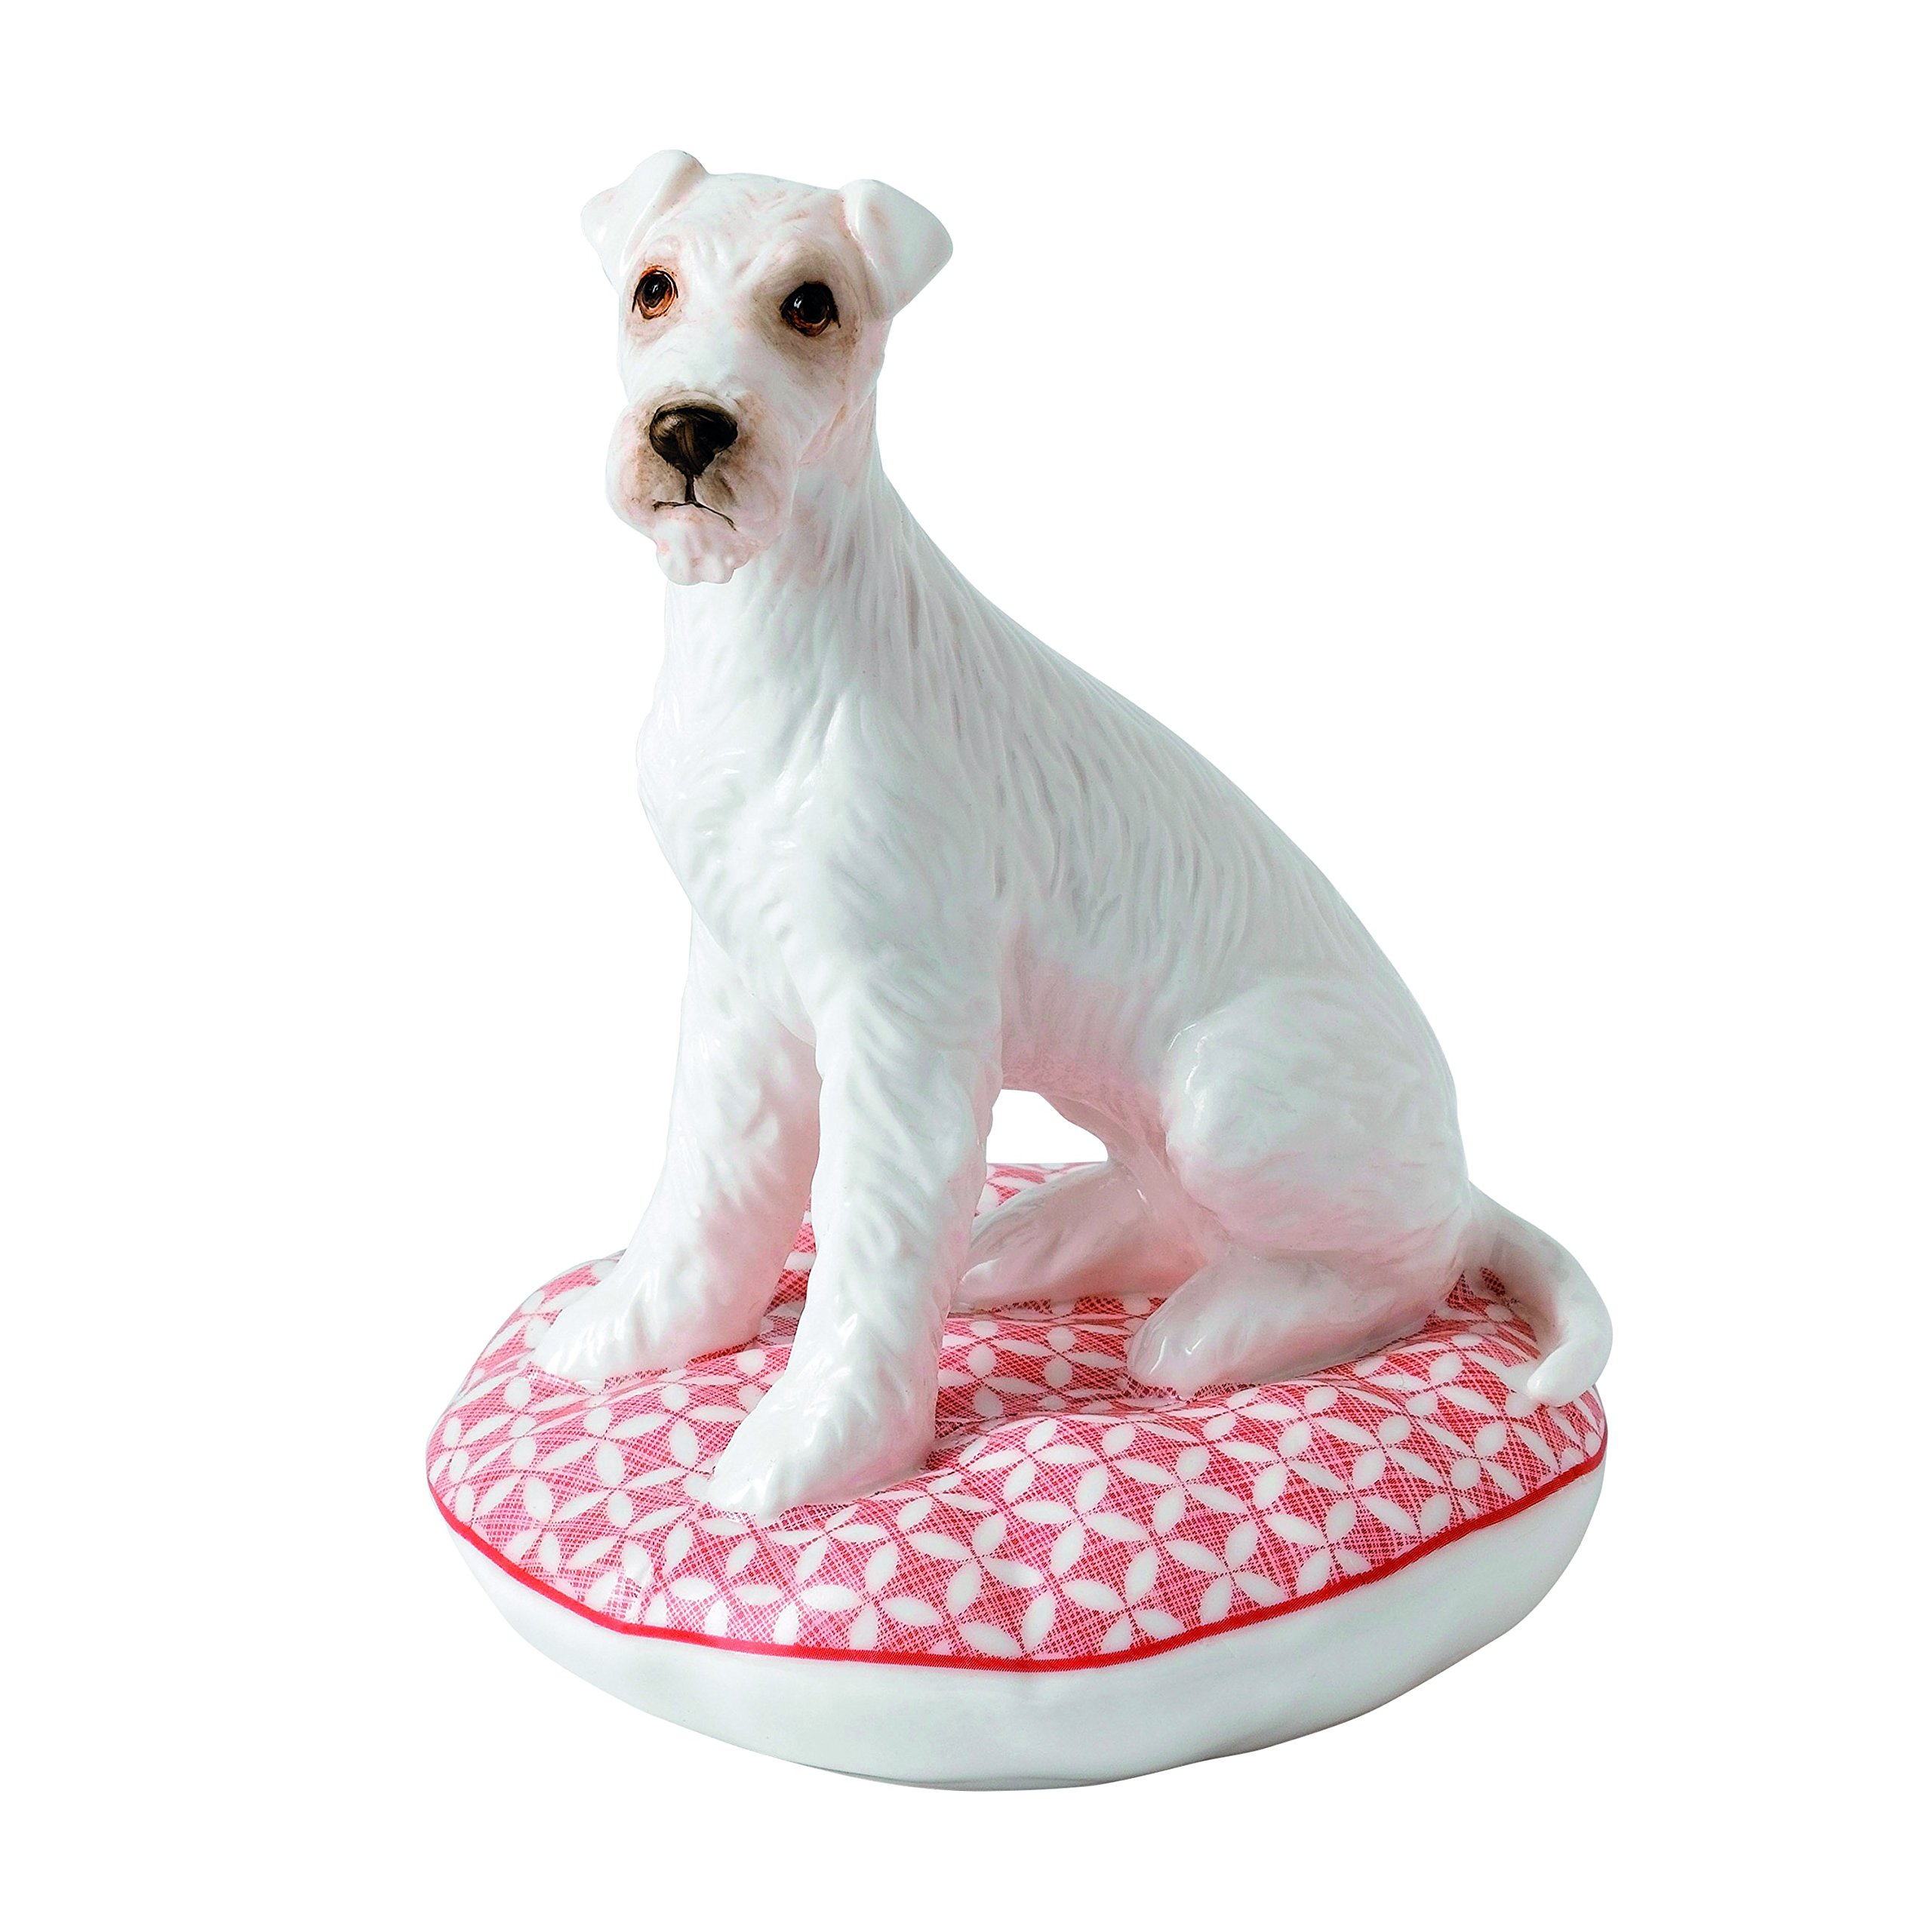 Royal Doulton Top Dogs Bobo-Airedale Terrier, Porcelain, White, 14.5